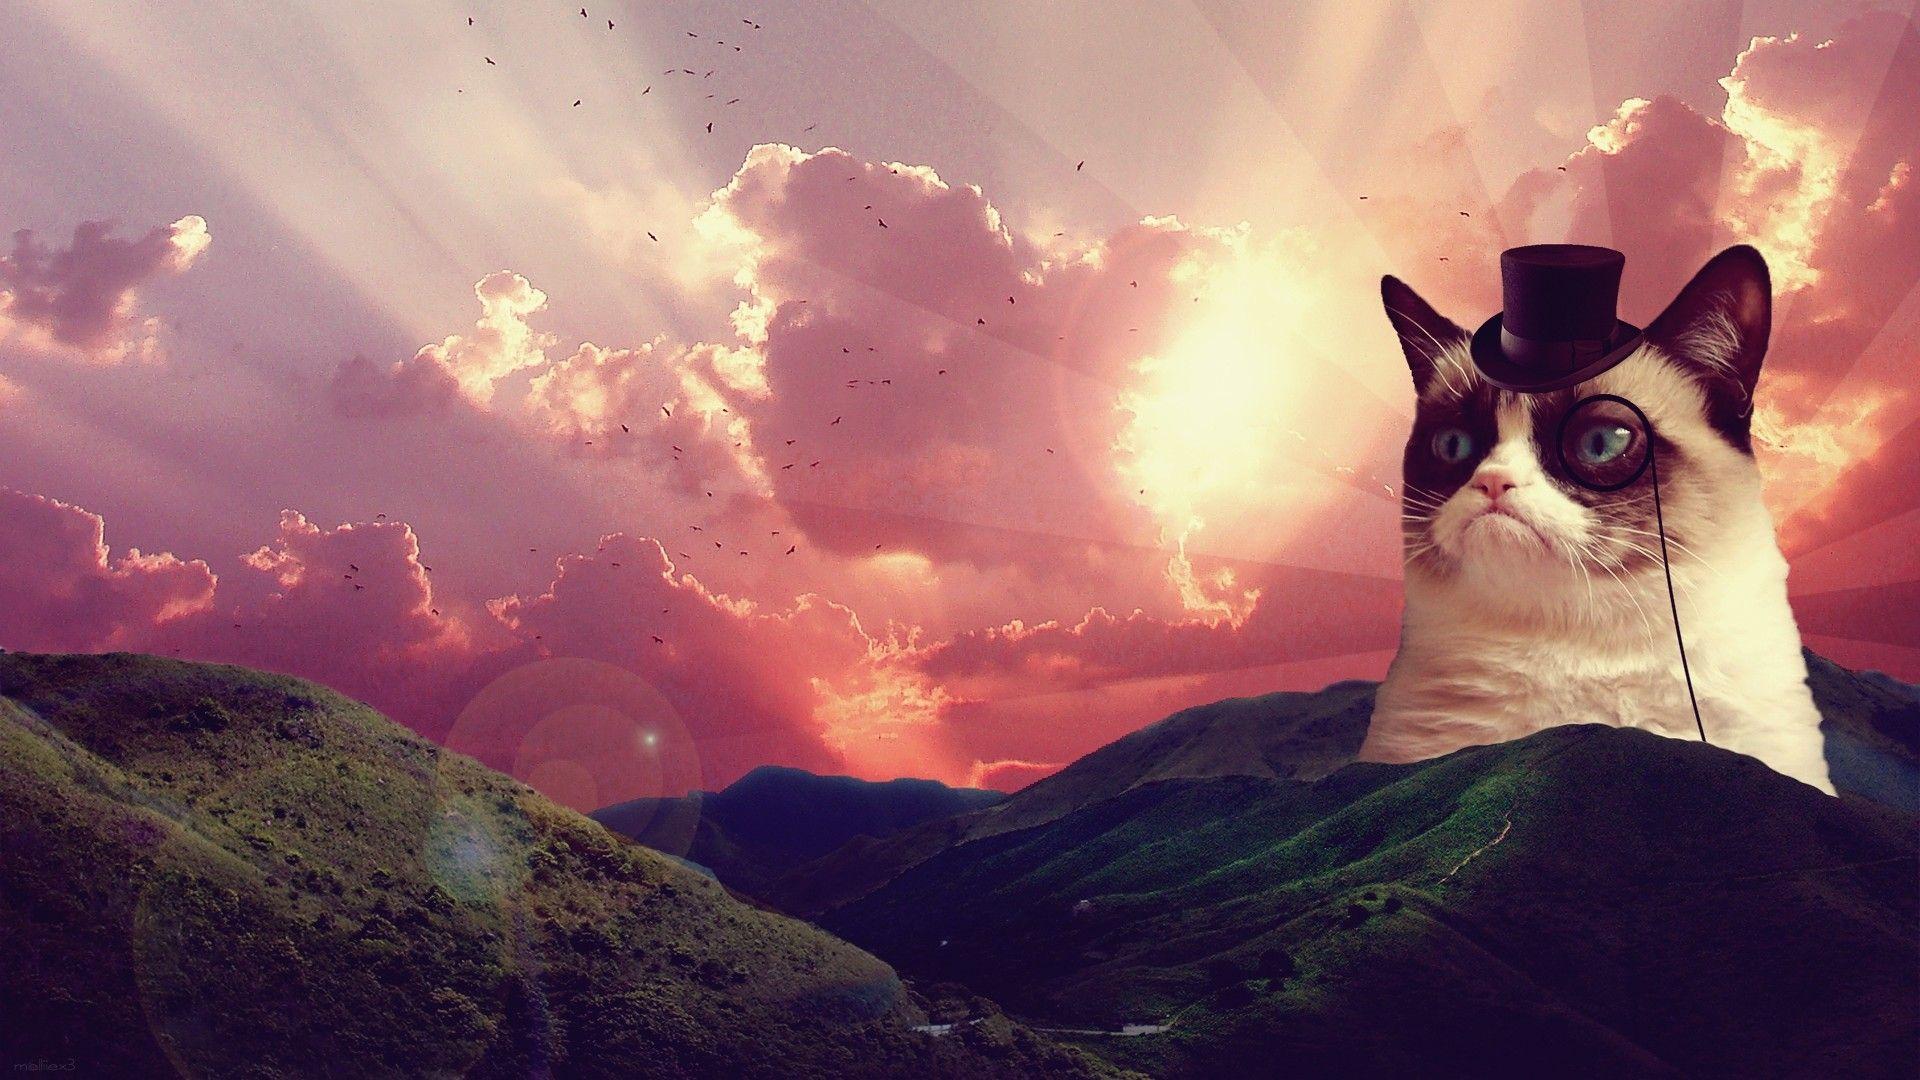 Res 1920x1080 Space Laser Cat Photo Wallpapers Cat Wallpaper Space Cat Grumpy Cat